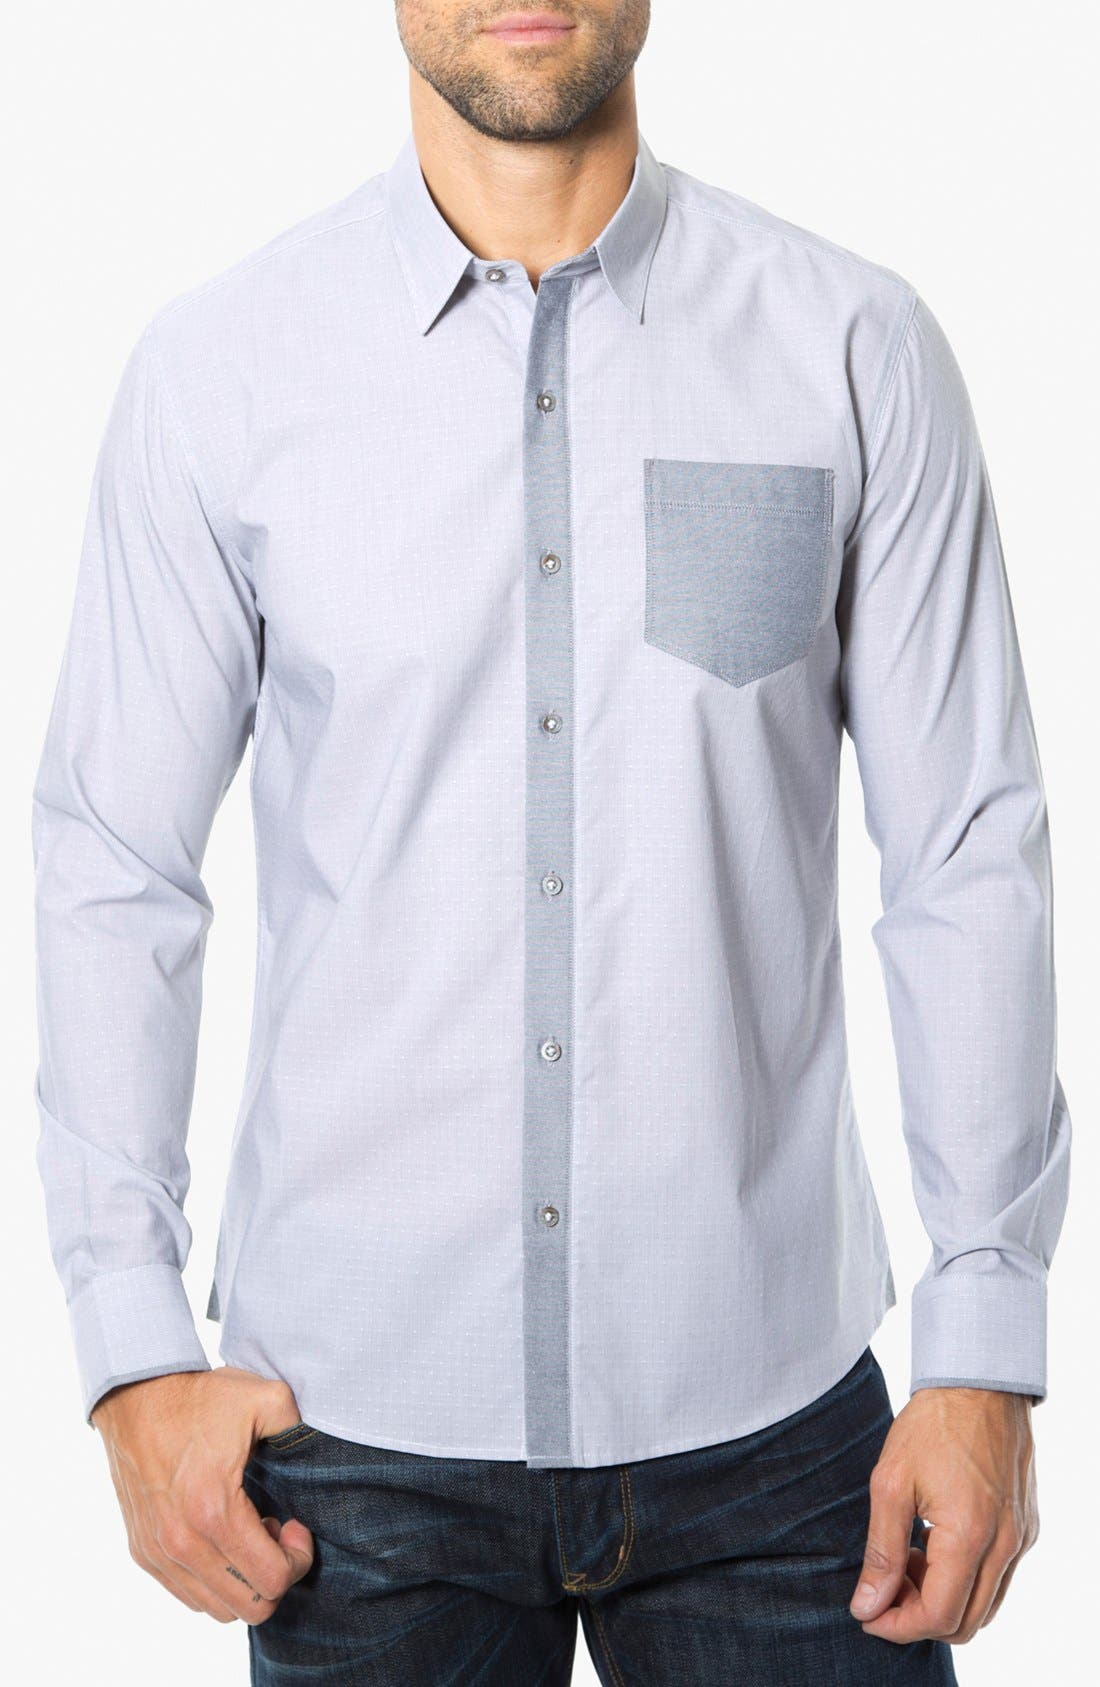 Main Image - 7 Diamonds 'Electric Company' Trim Fit Cotton Sport Shirt